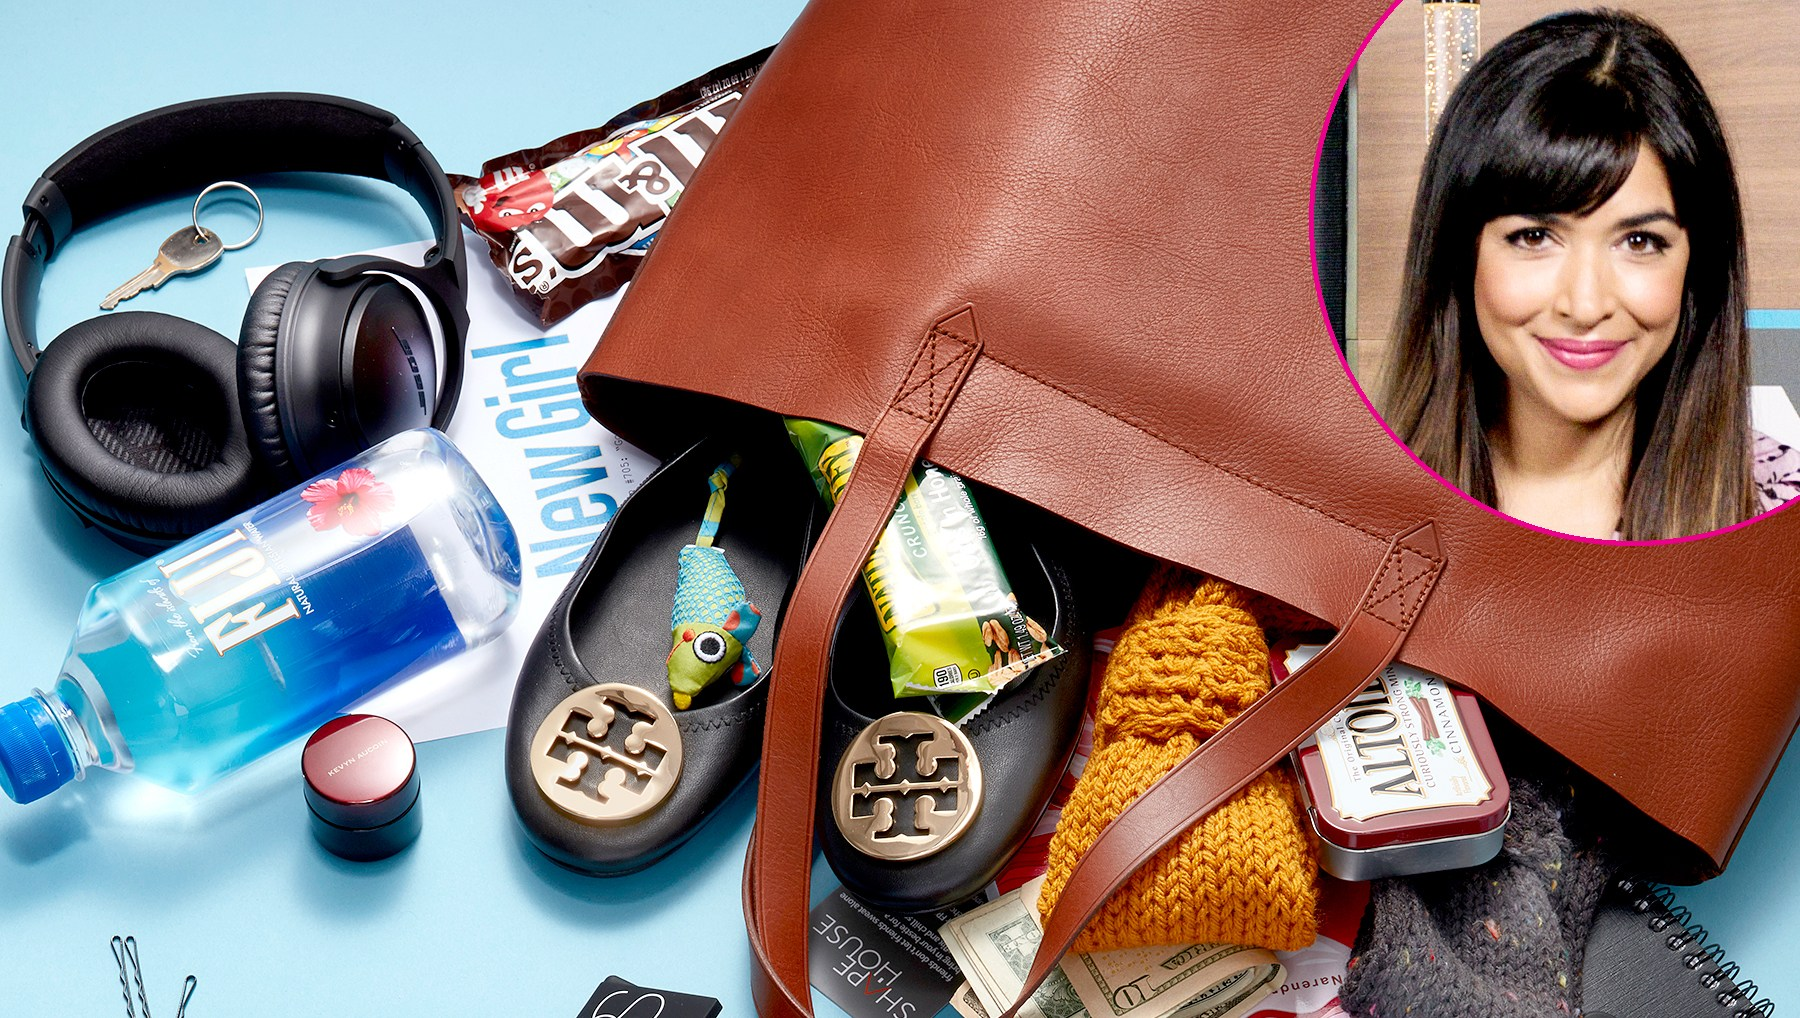 Hannah Simone's bag